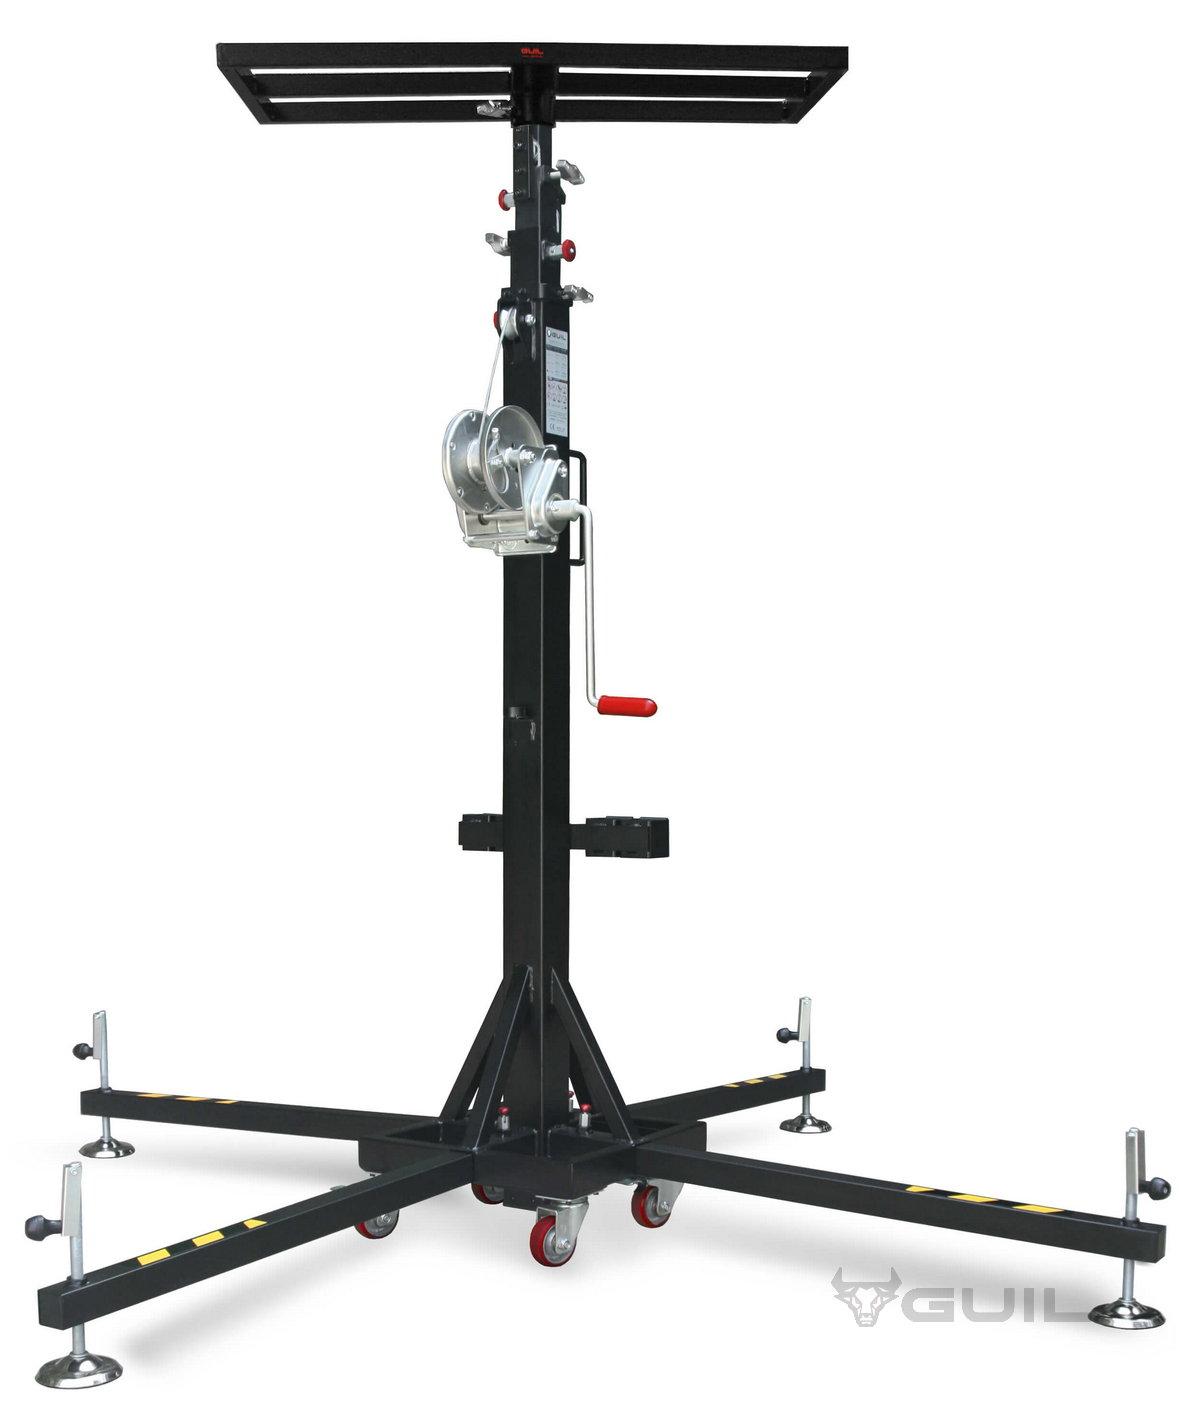 Materiaallift 1,8-5,4 m 180 kg (3)